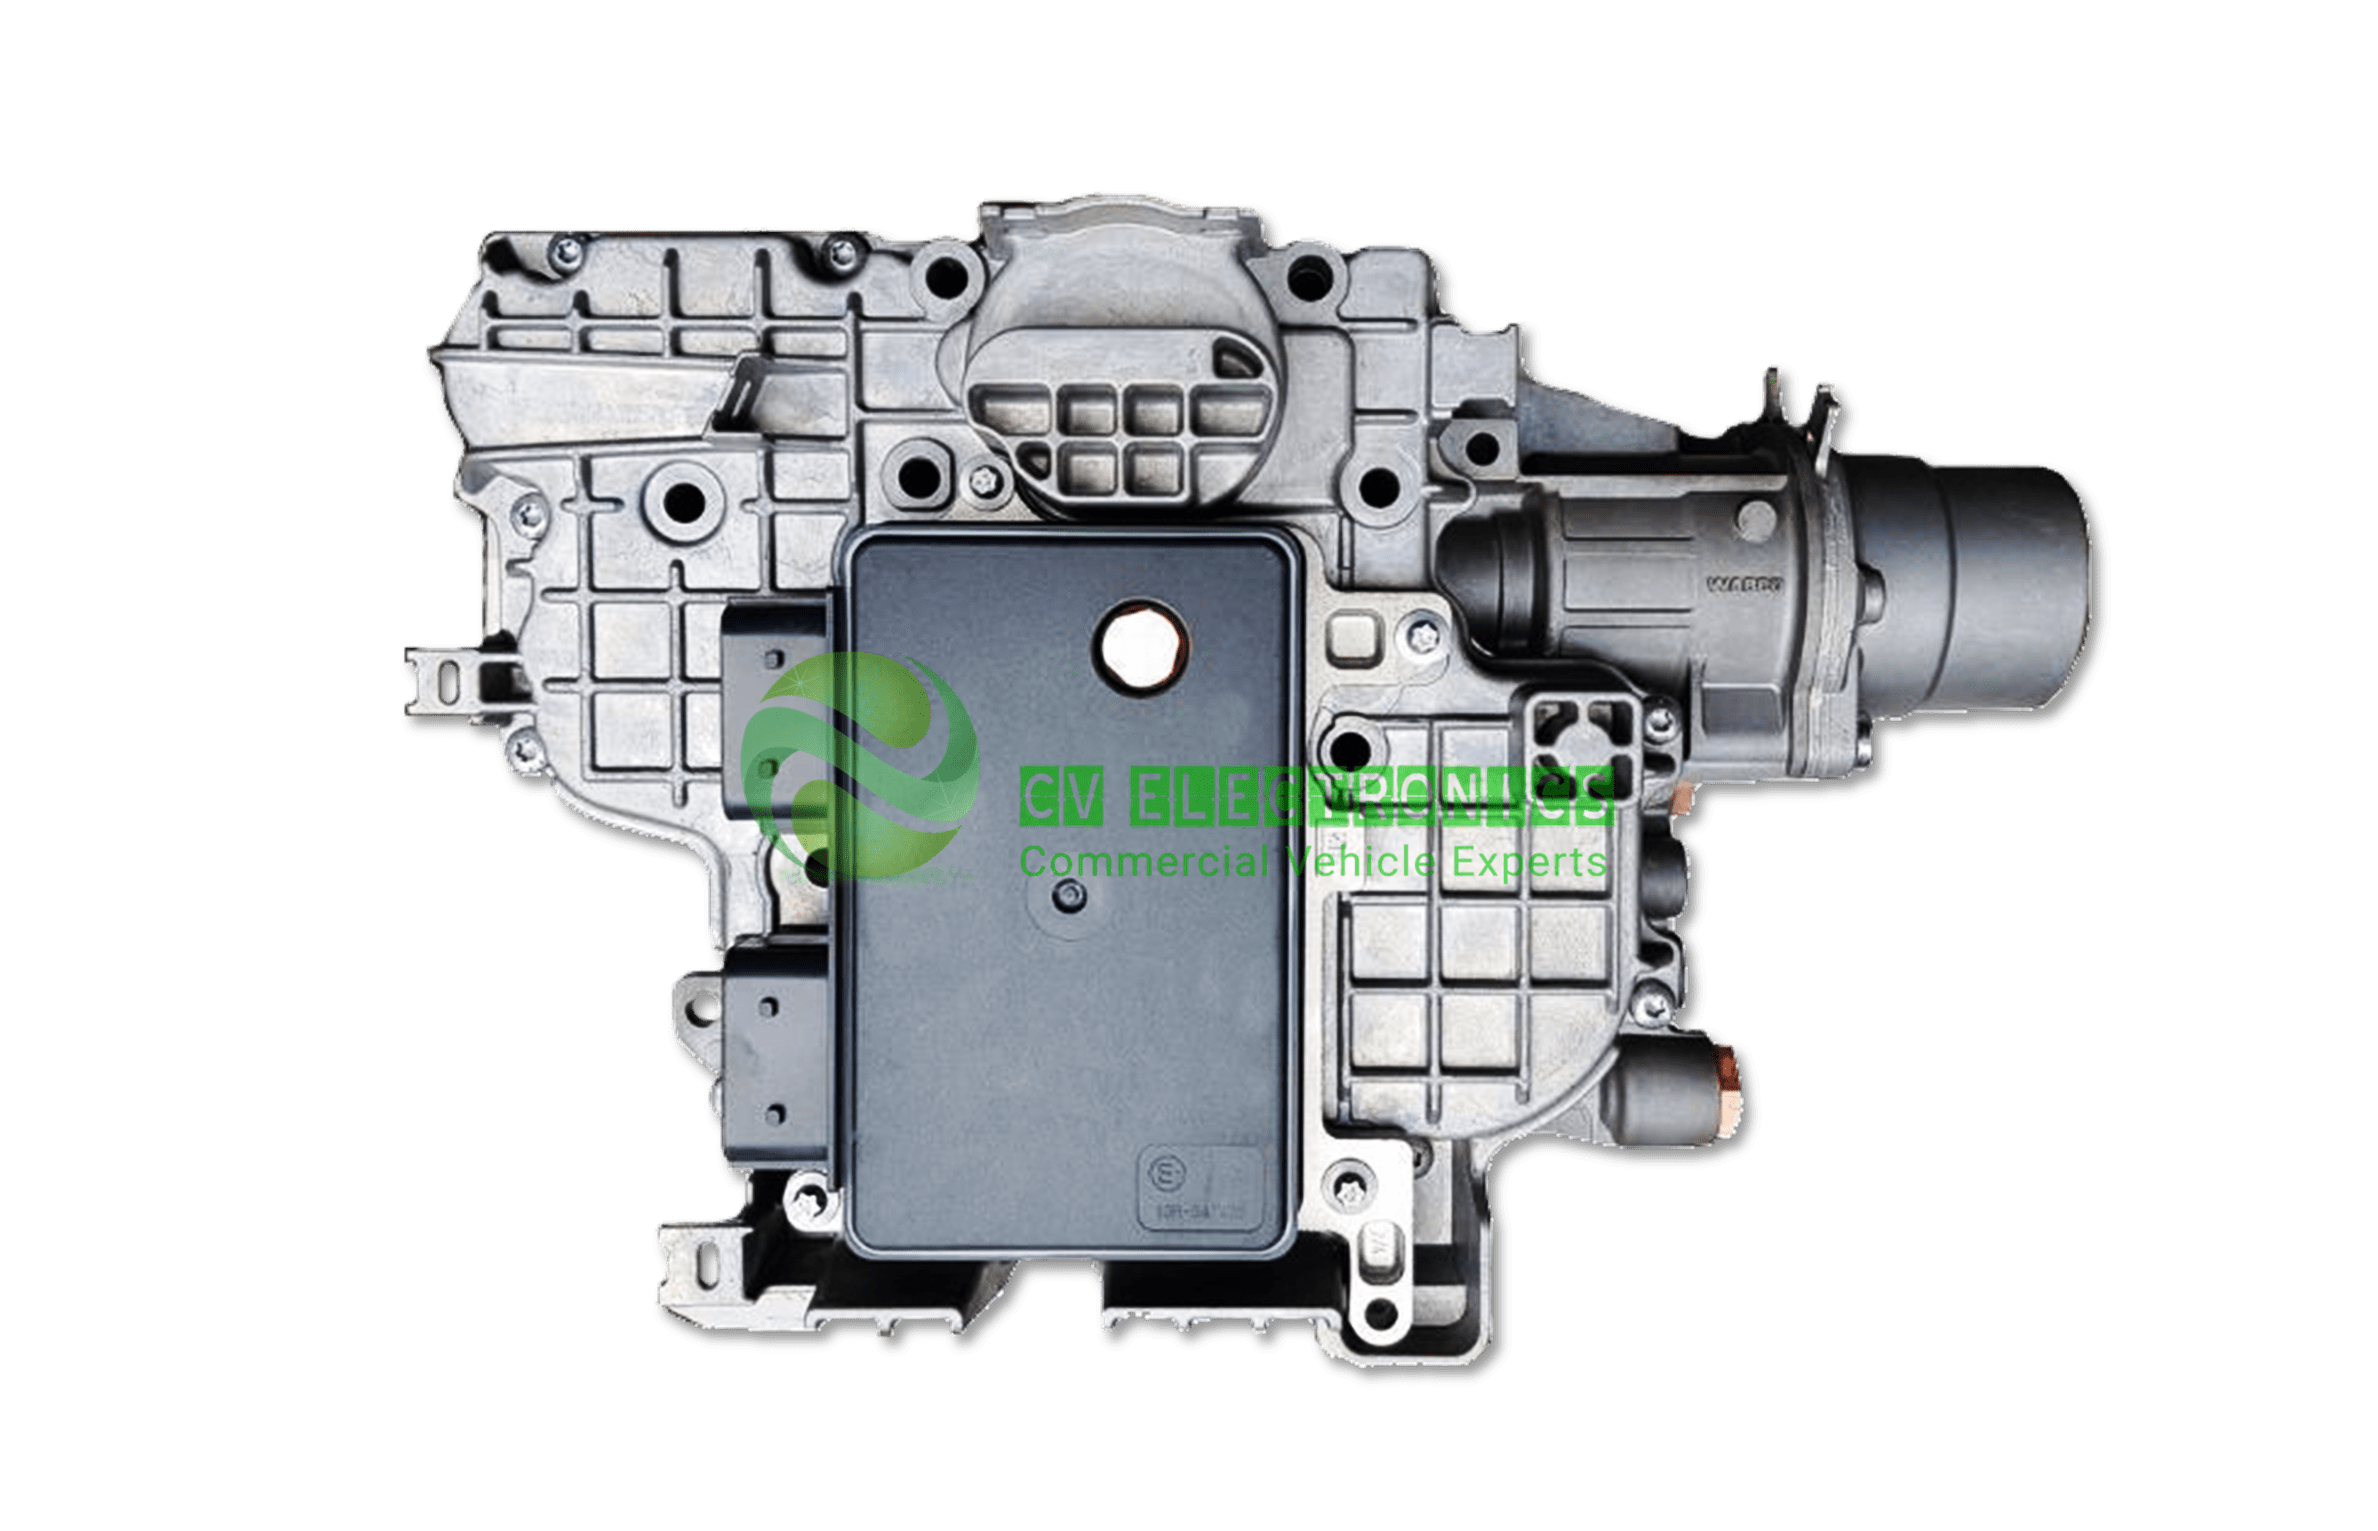 Mercedes Actros MP4 TCM Transmission Control Module repair